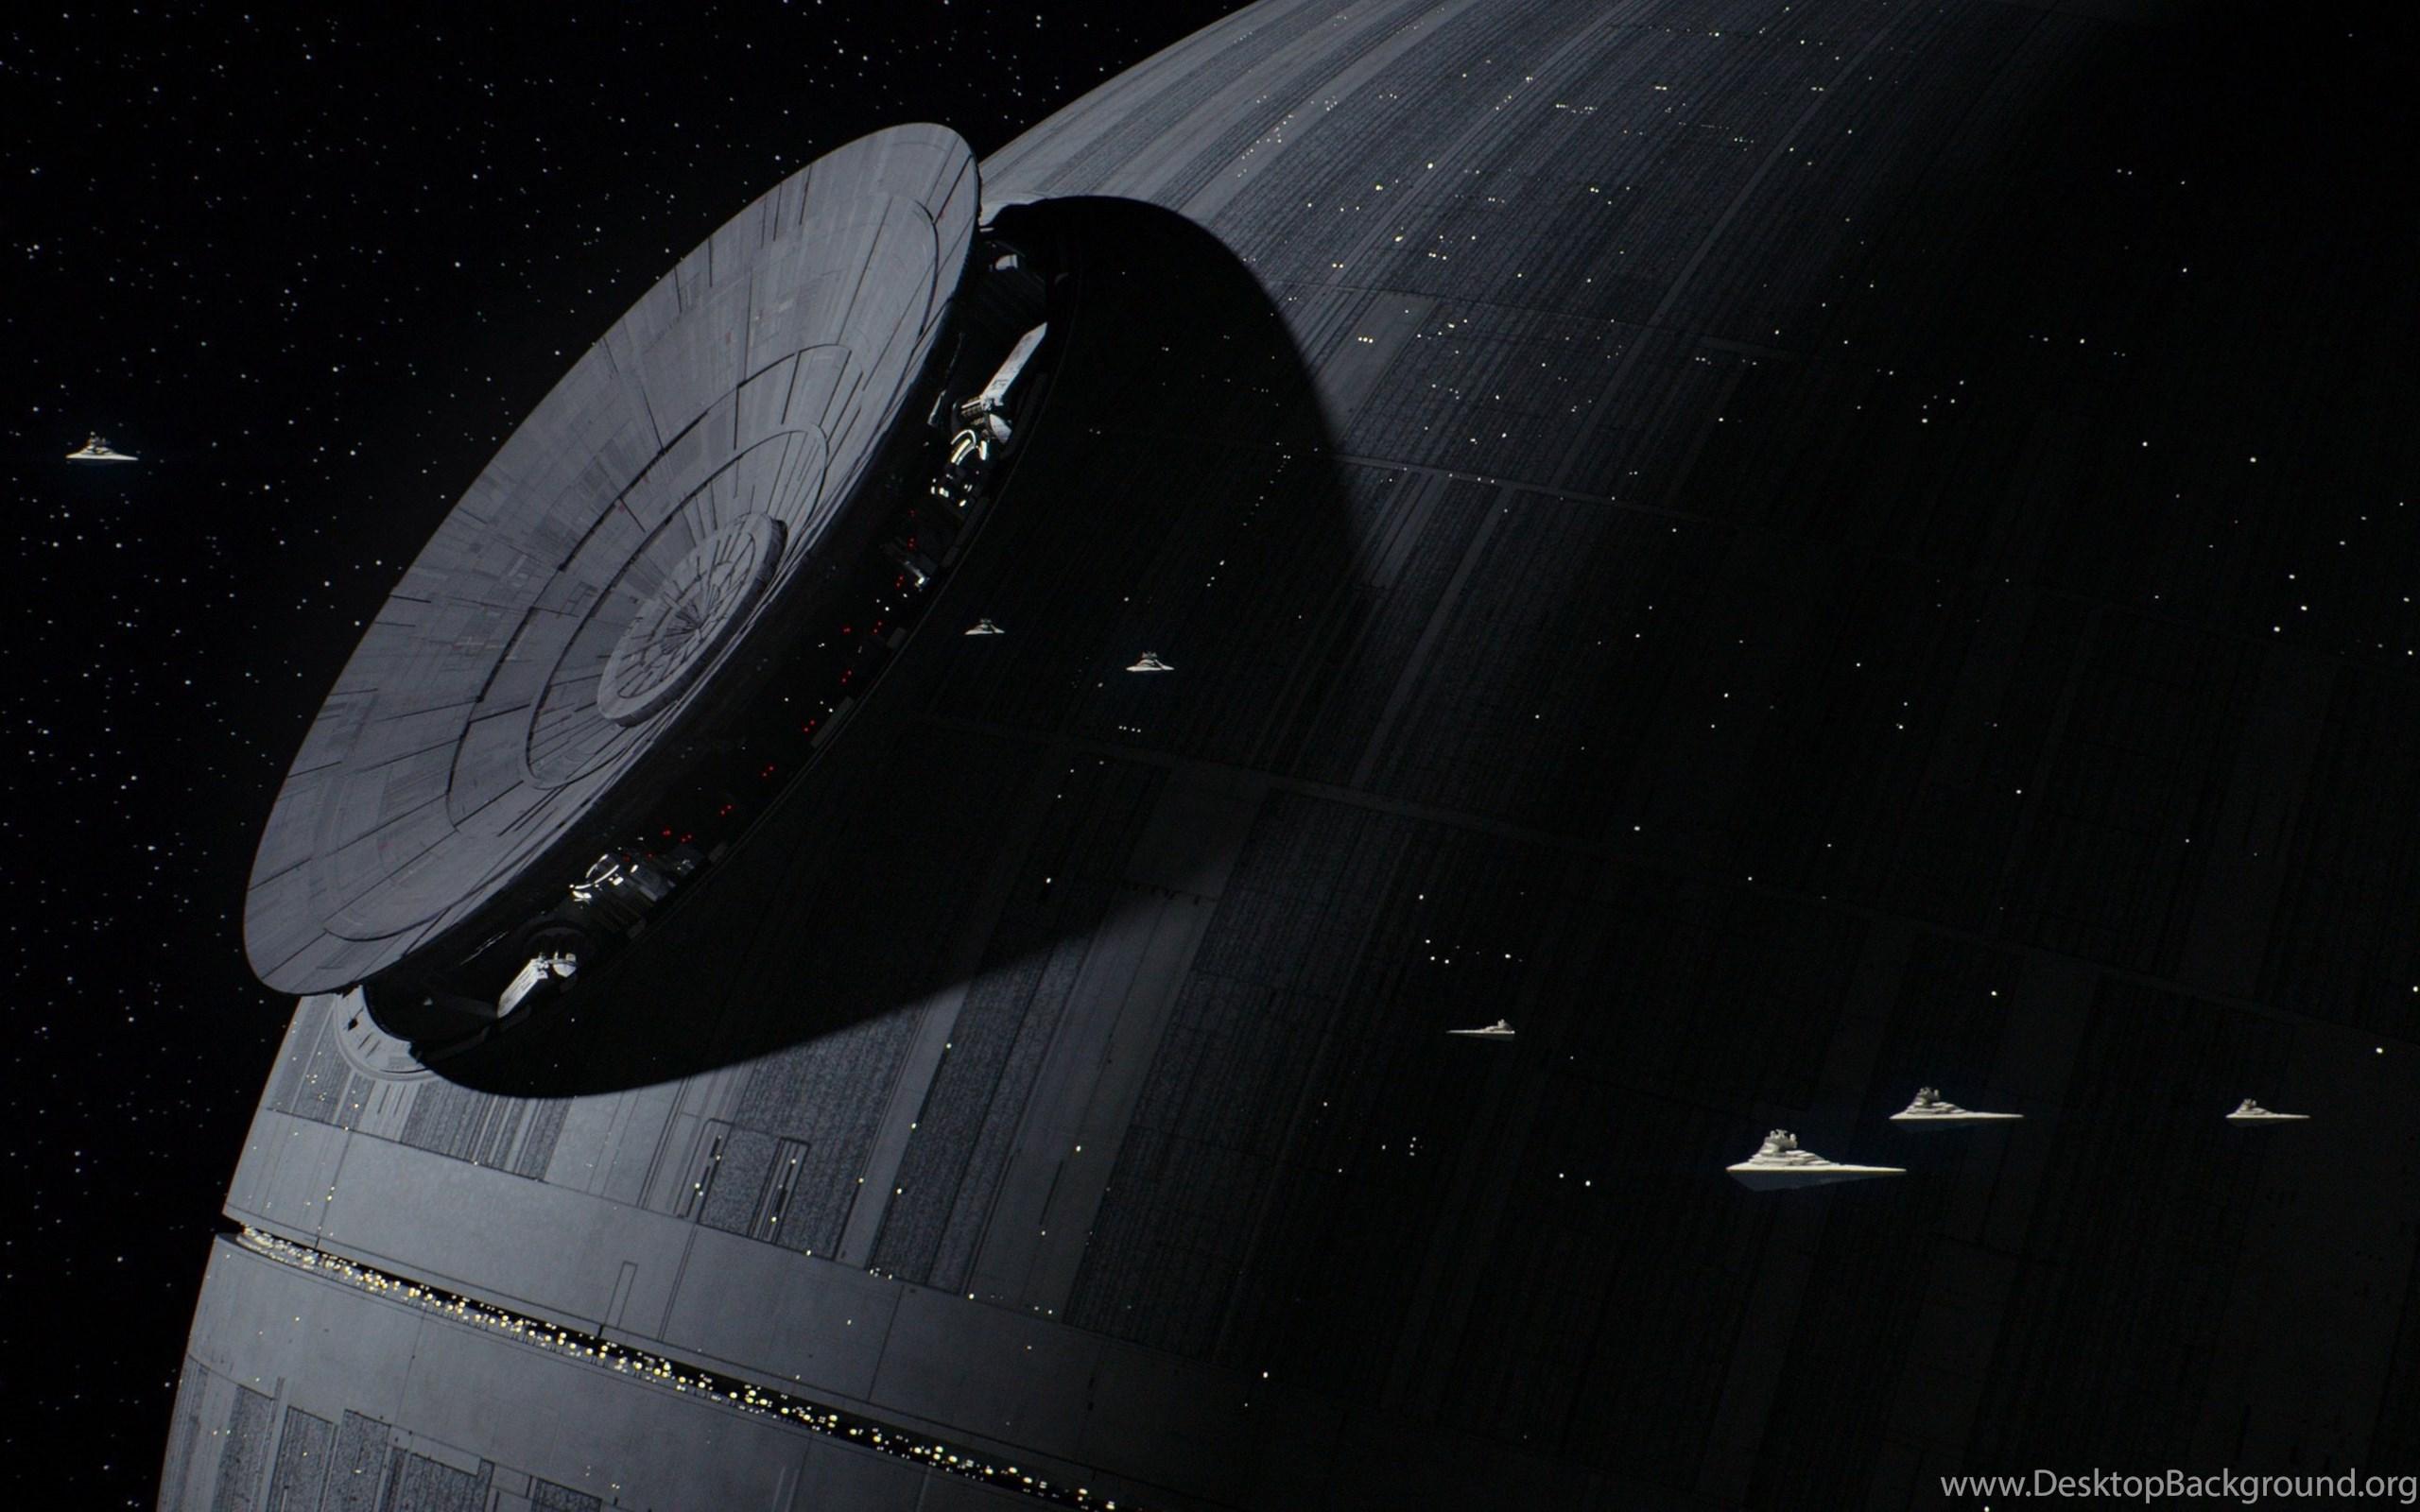 Star Wars Rogue One Iphone 7 Plus Wallpaper Vinnyoleo Vegetalinfo